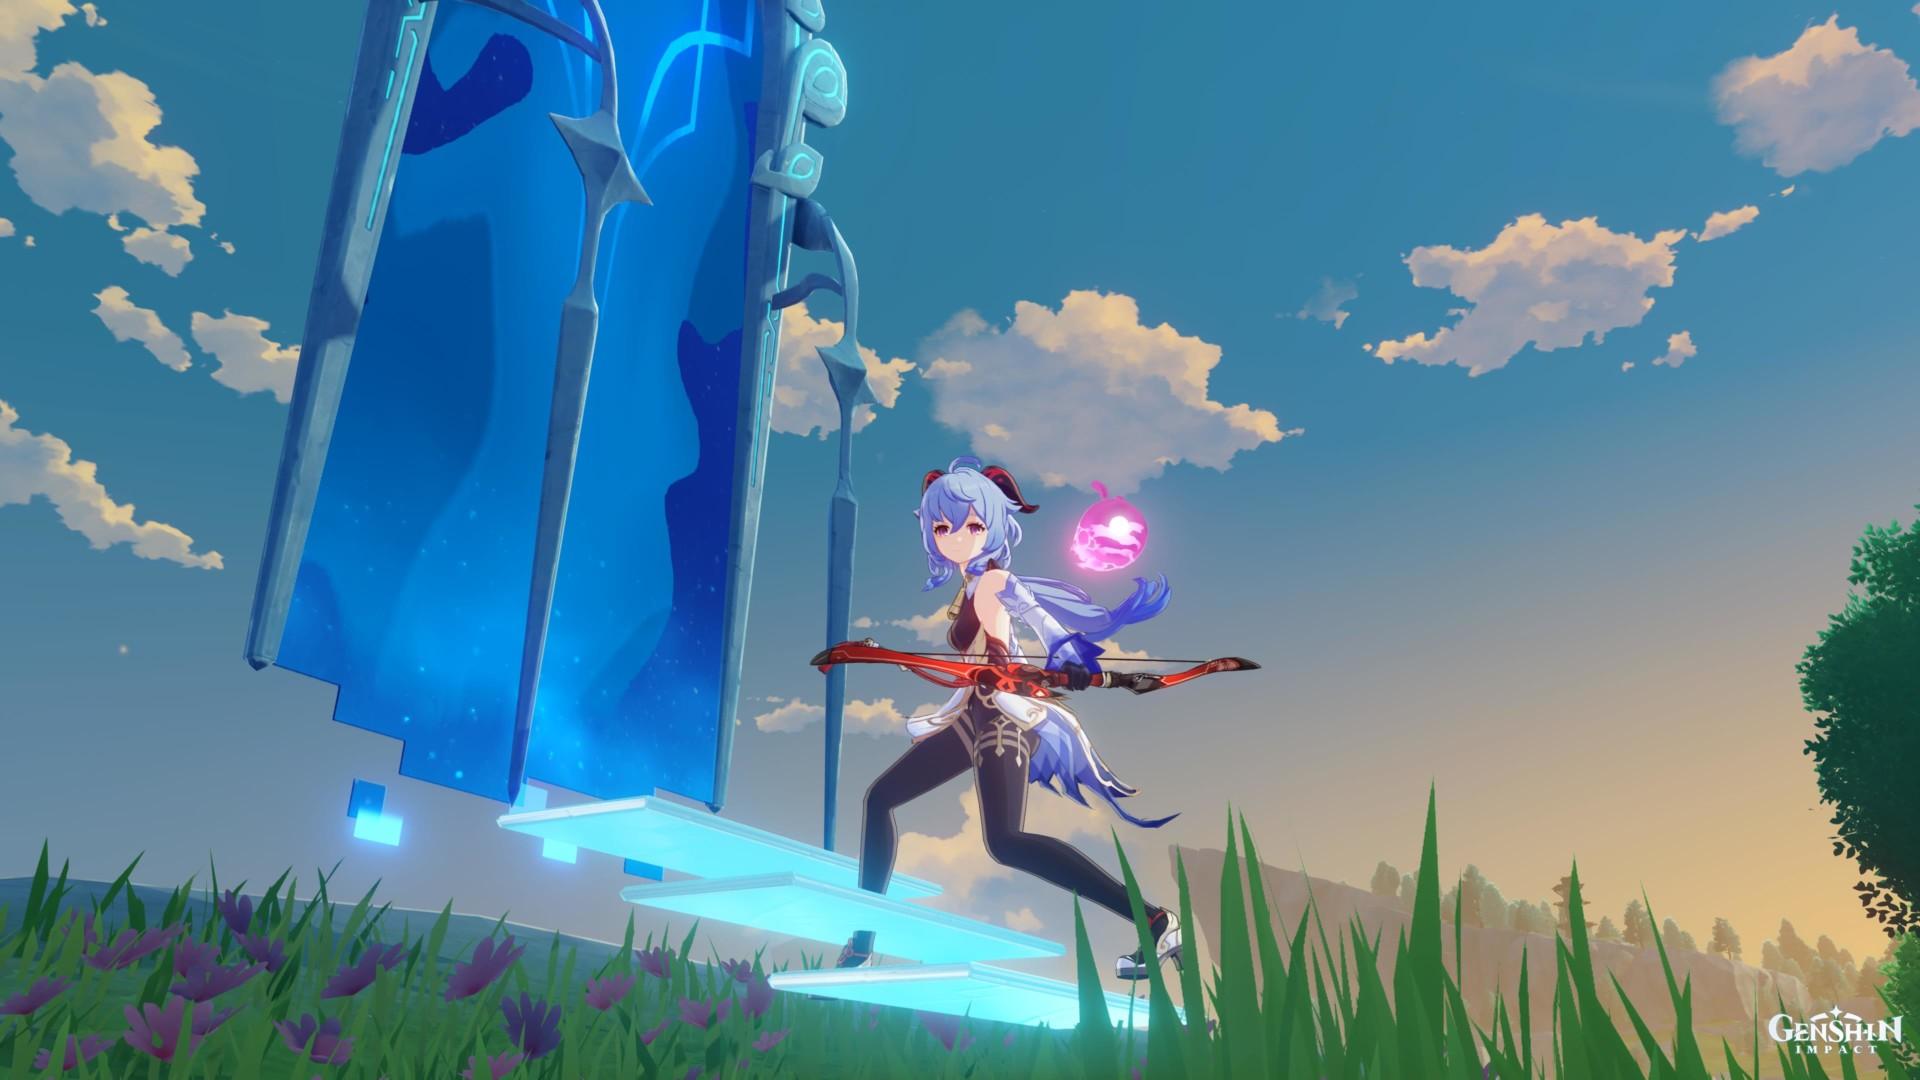 genshin-impact:-peculiar-wonderland-—-peculiar-conqueror-iii-guide